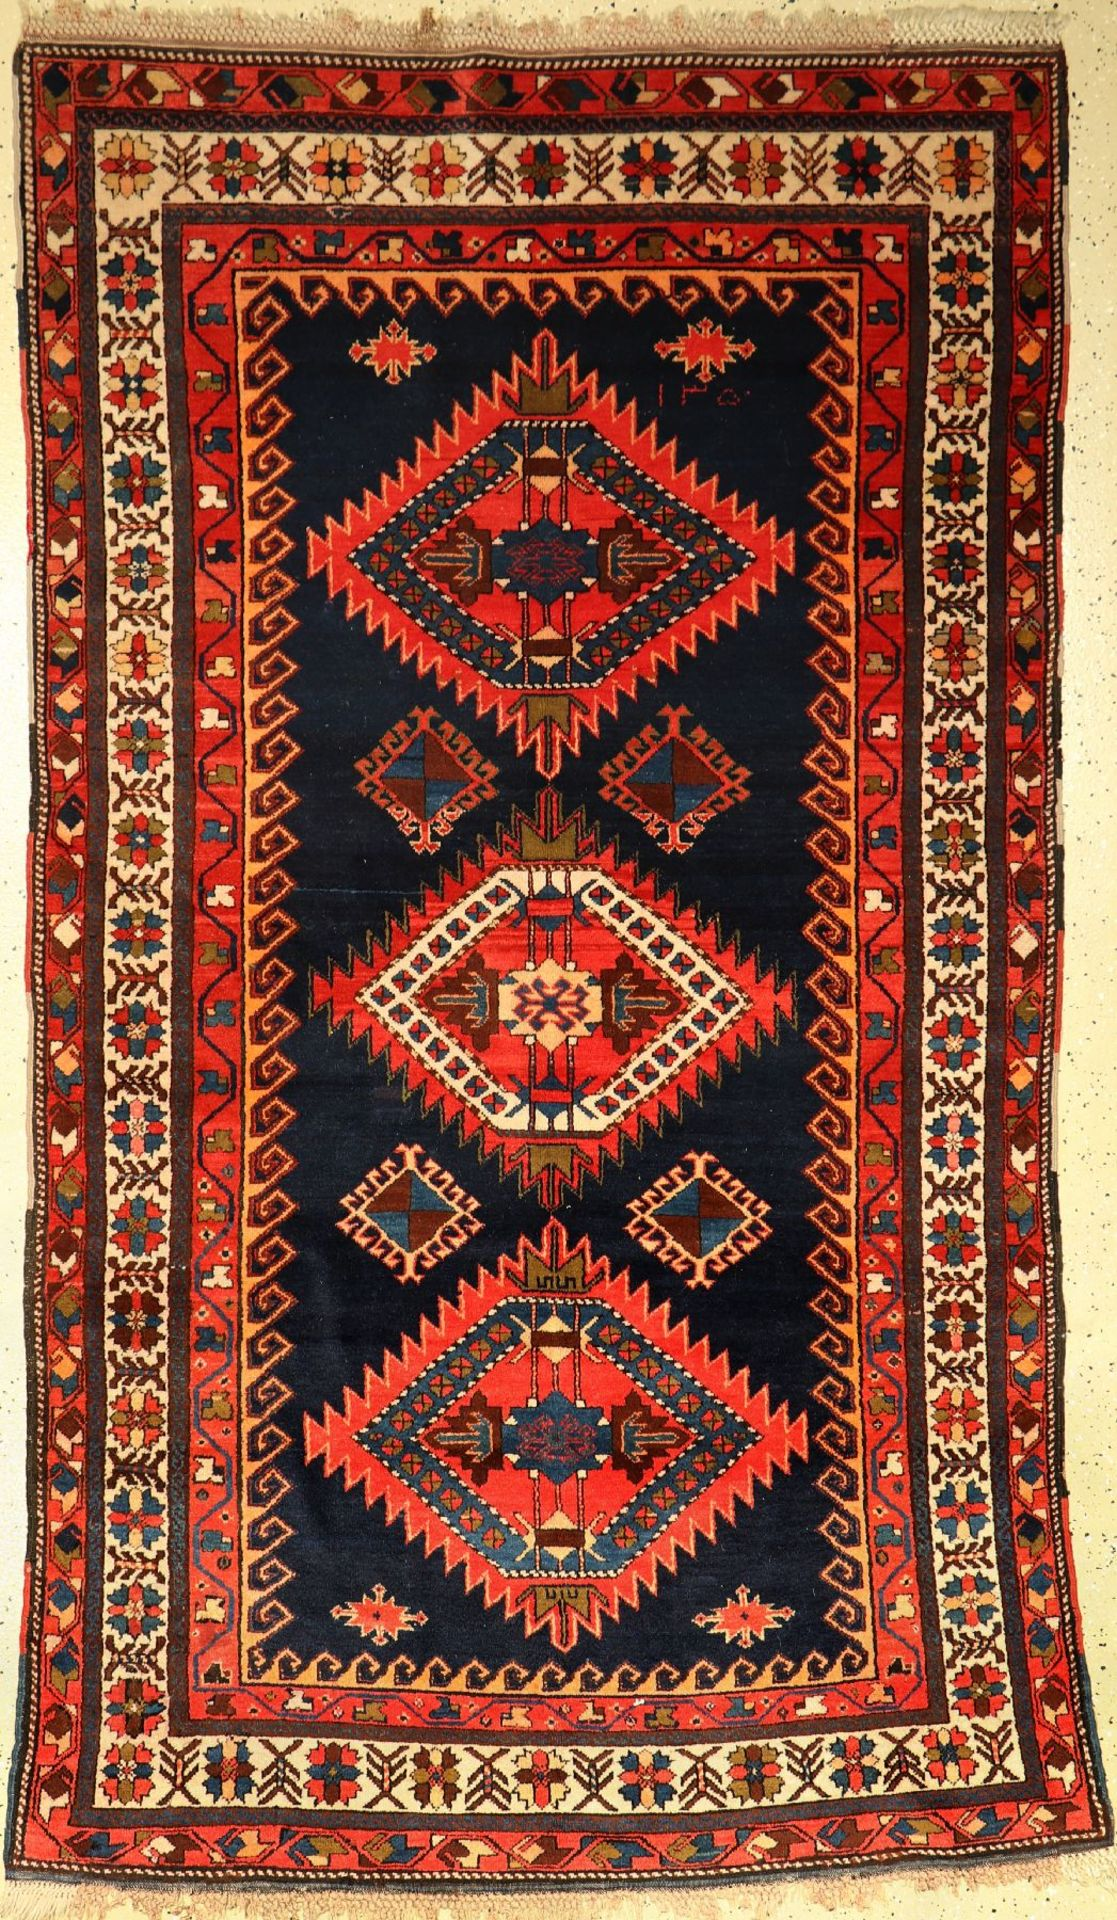 Erivan alt, Kaukasus, um 1930, Wolle auf Wolle, ca. 220 x 130 cm, EHZ: 2-3Erivan old, Caucasus,